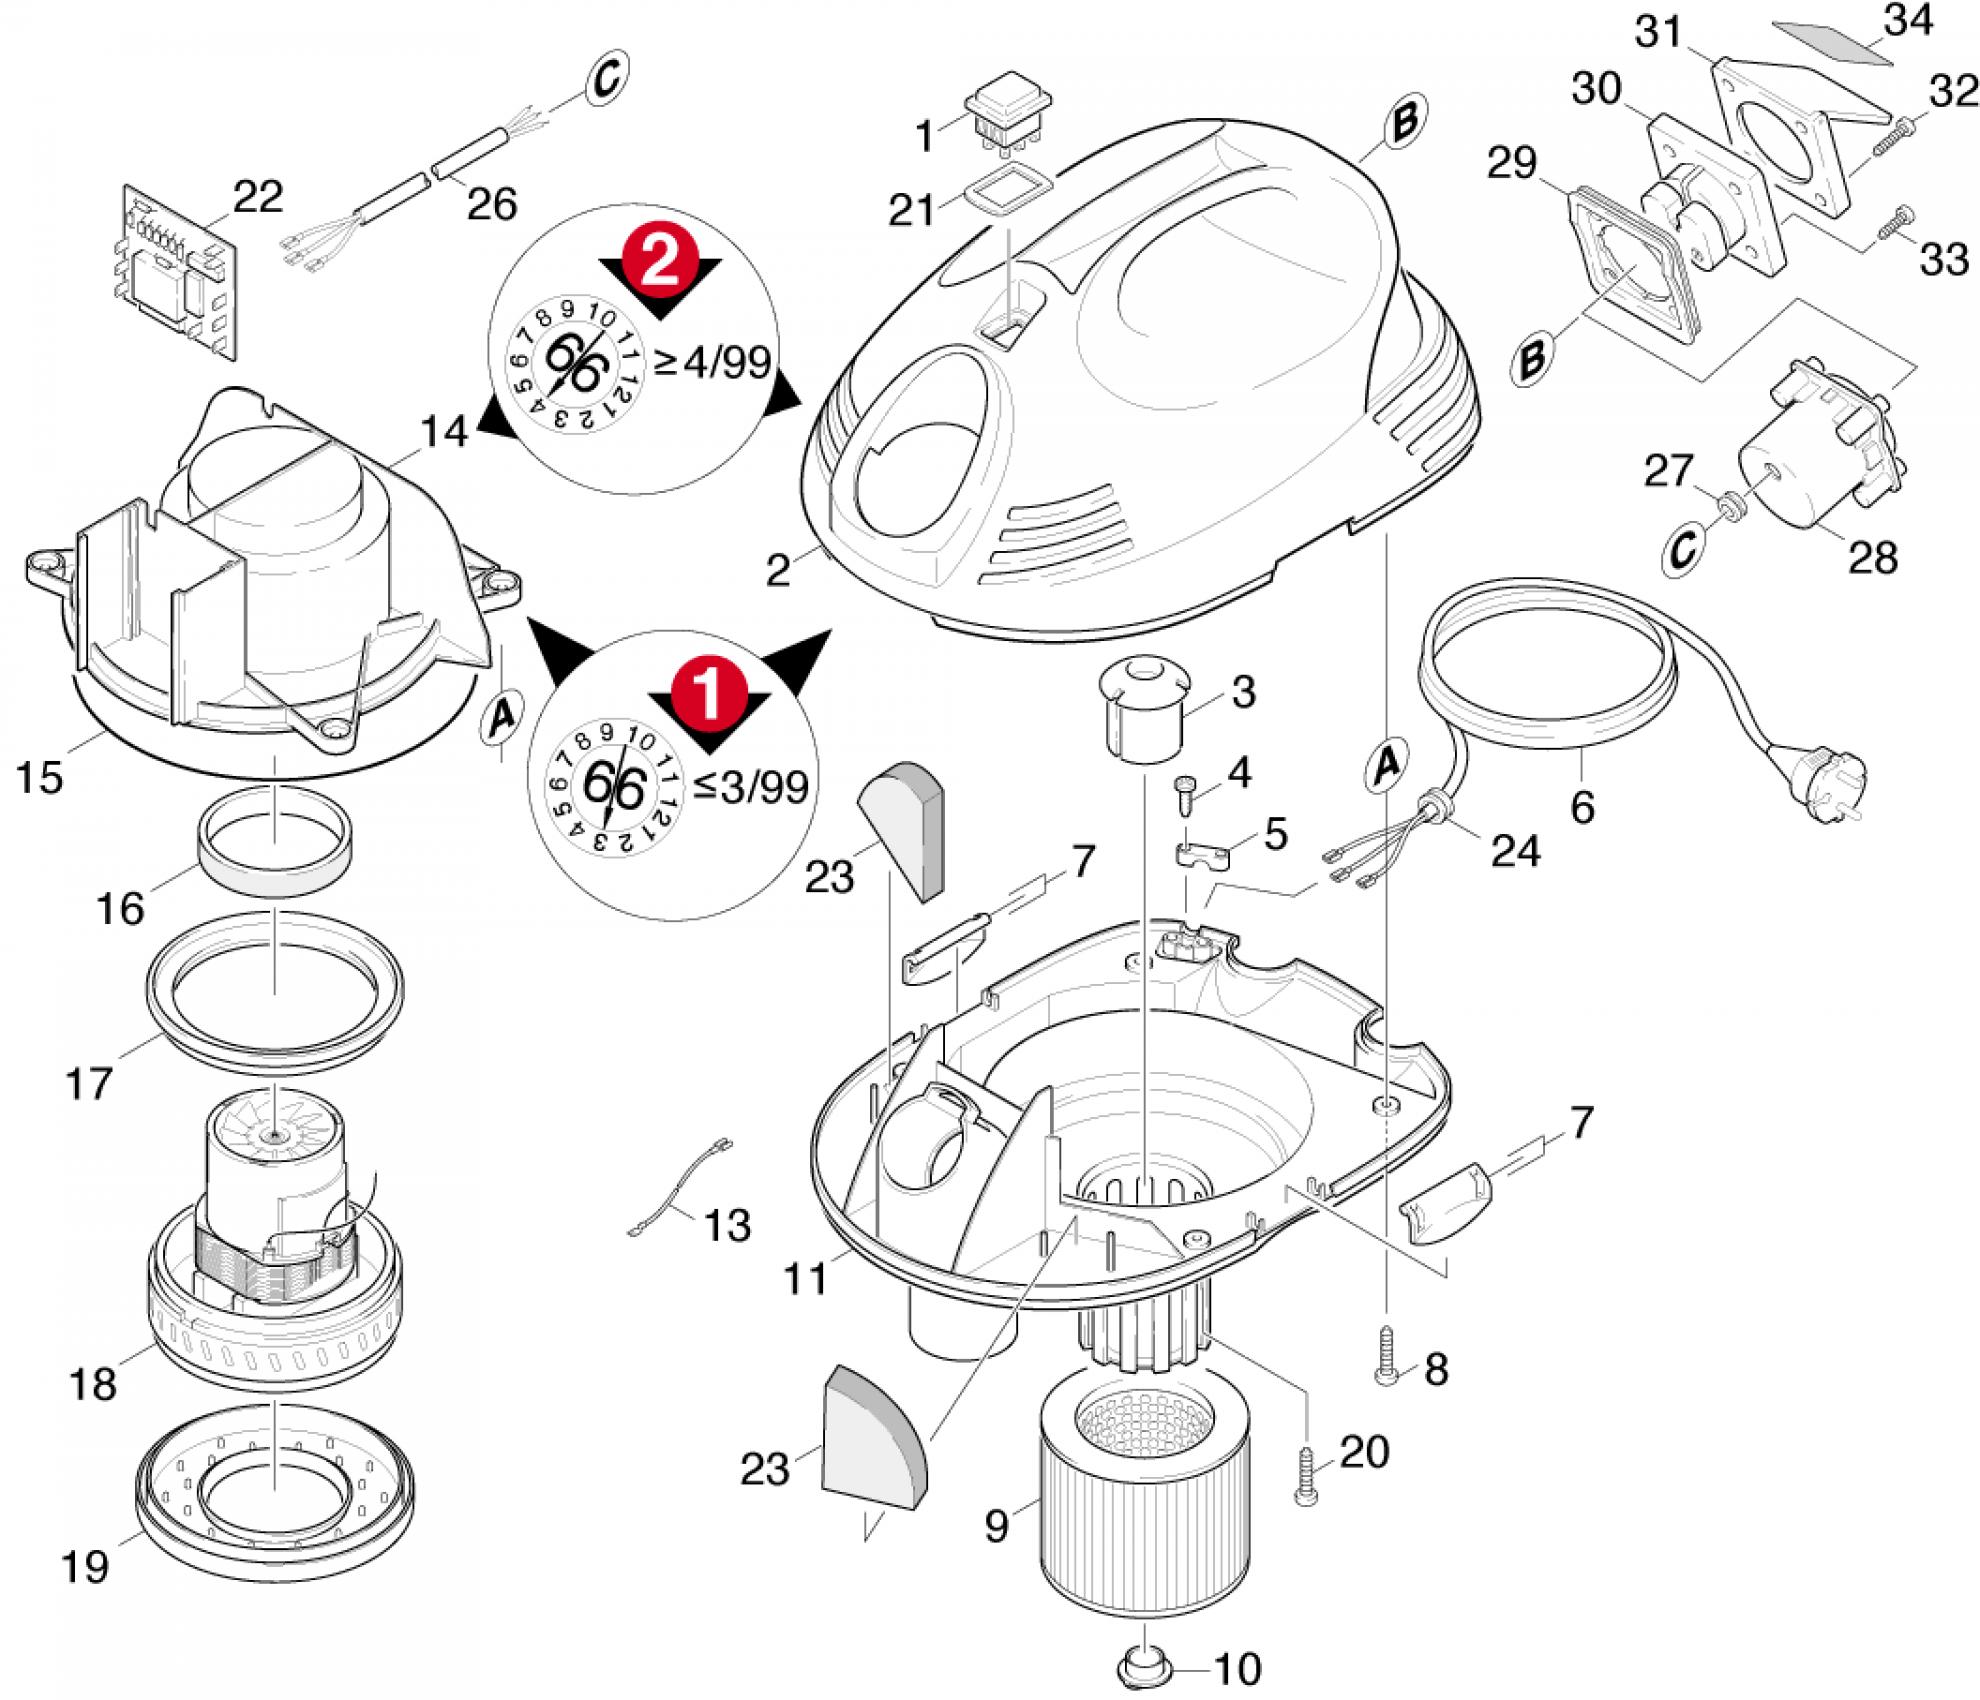 pi ces d tach es aspirateur karcher k 2101 te fr. Black Bedroom Furniture Sets. Home Design Ideas